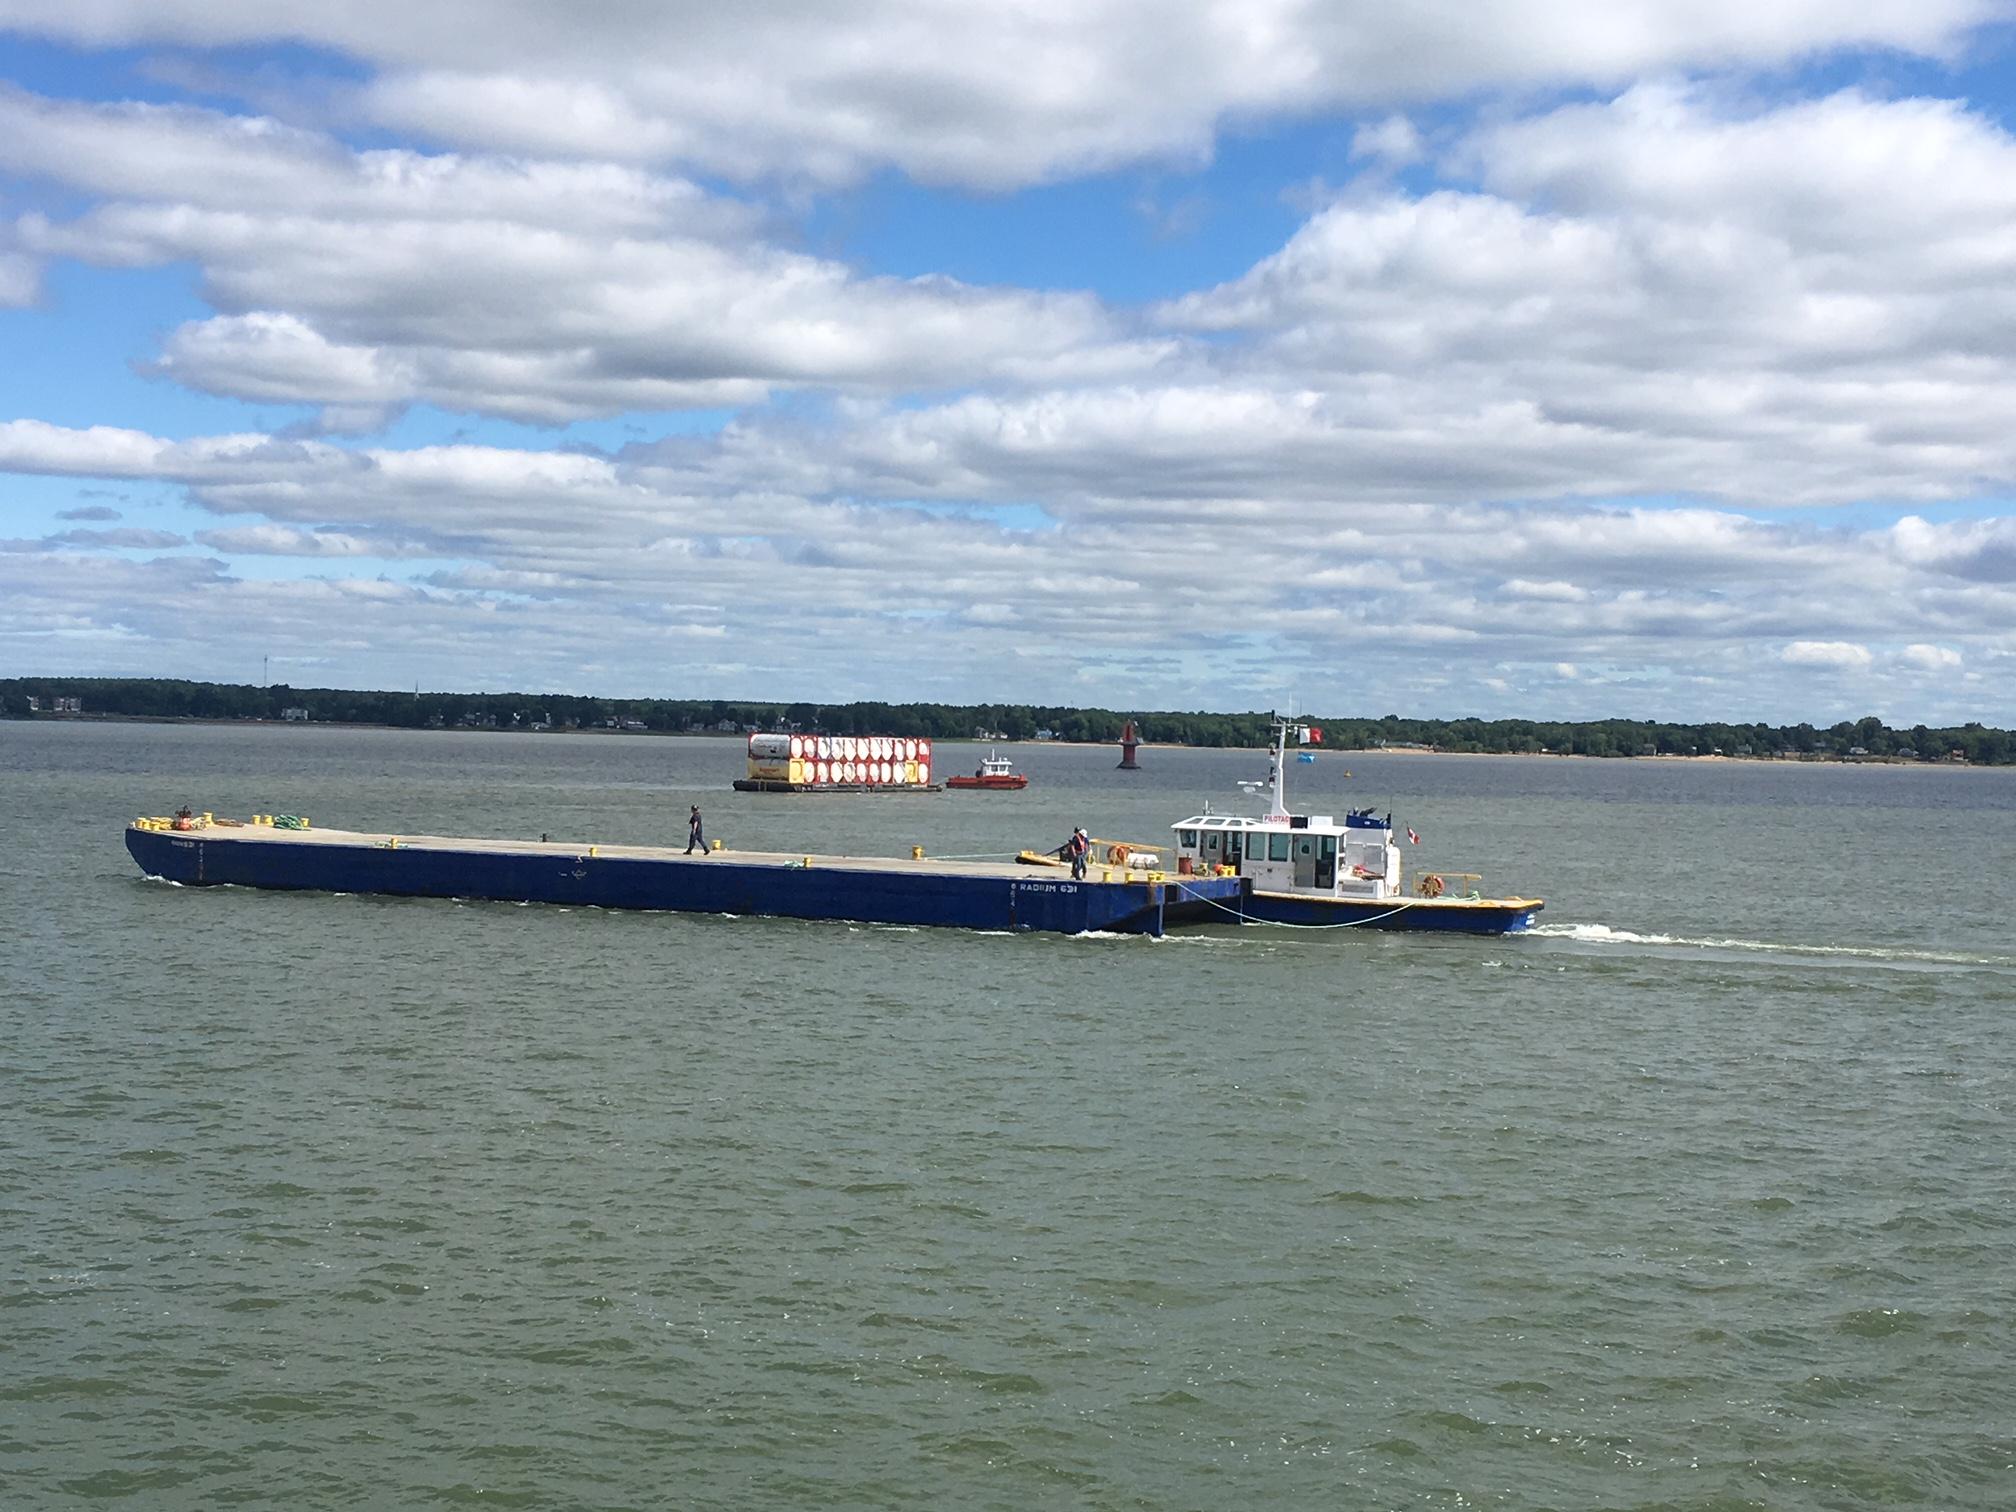 Sauvetage_Maritime-Umiavut-Barge-Radium-14082018-001